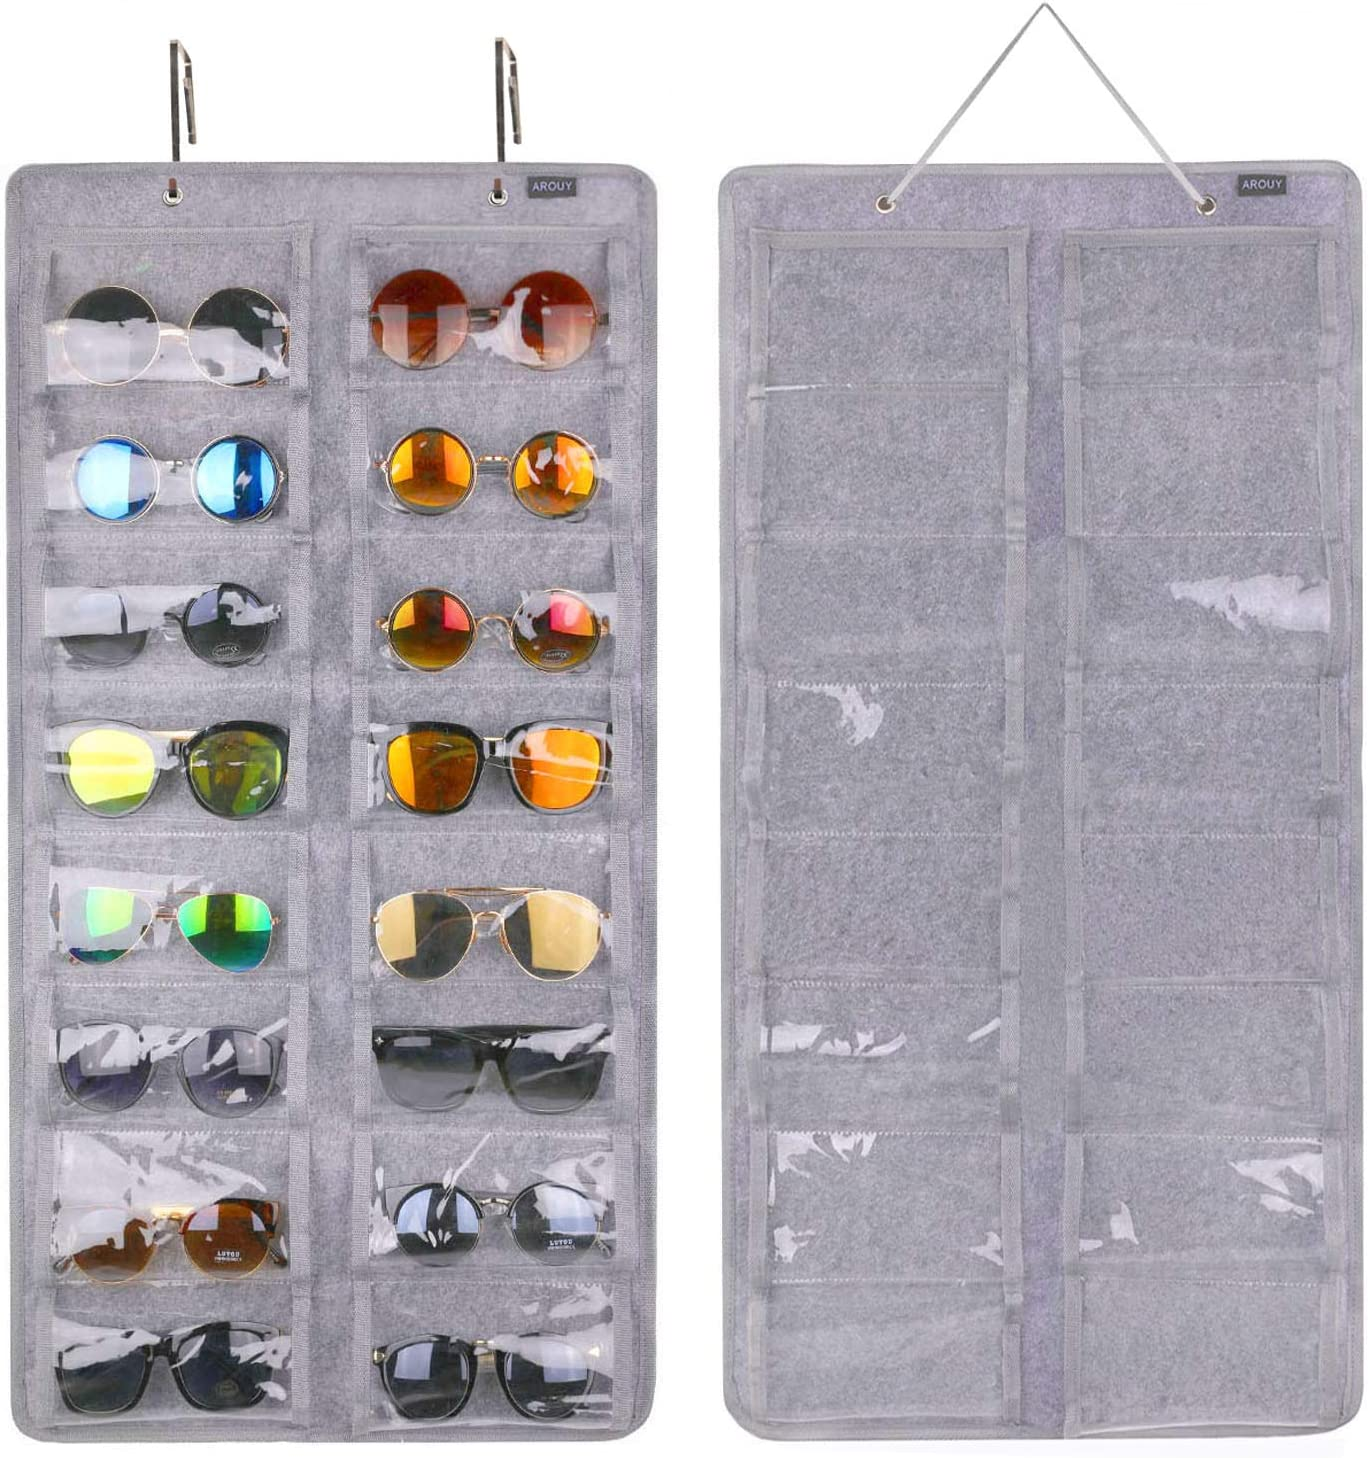 Eyewear Storage. 16 Felt Slots Sunglasses Organizer Holder with Sturdy Rope Sunglasses Organizer Storage Hanging Dust Proof Wall Pocket Glasses Organizer Eyeglasses Display Case